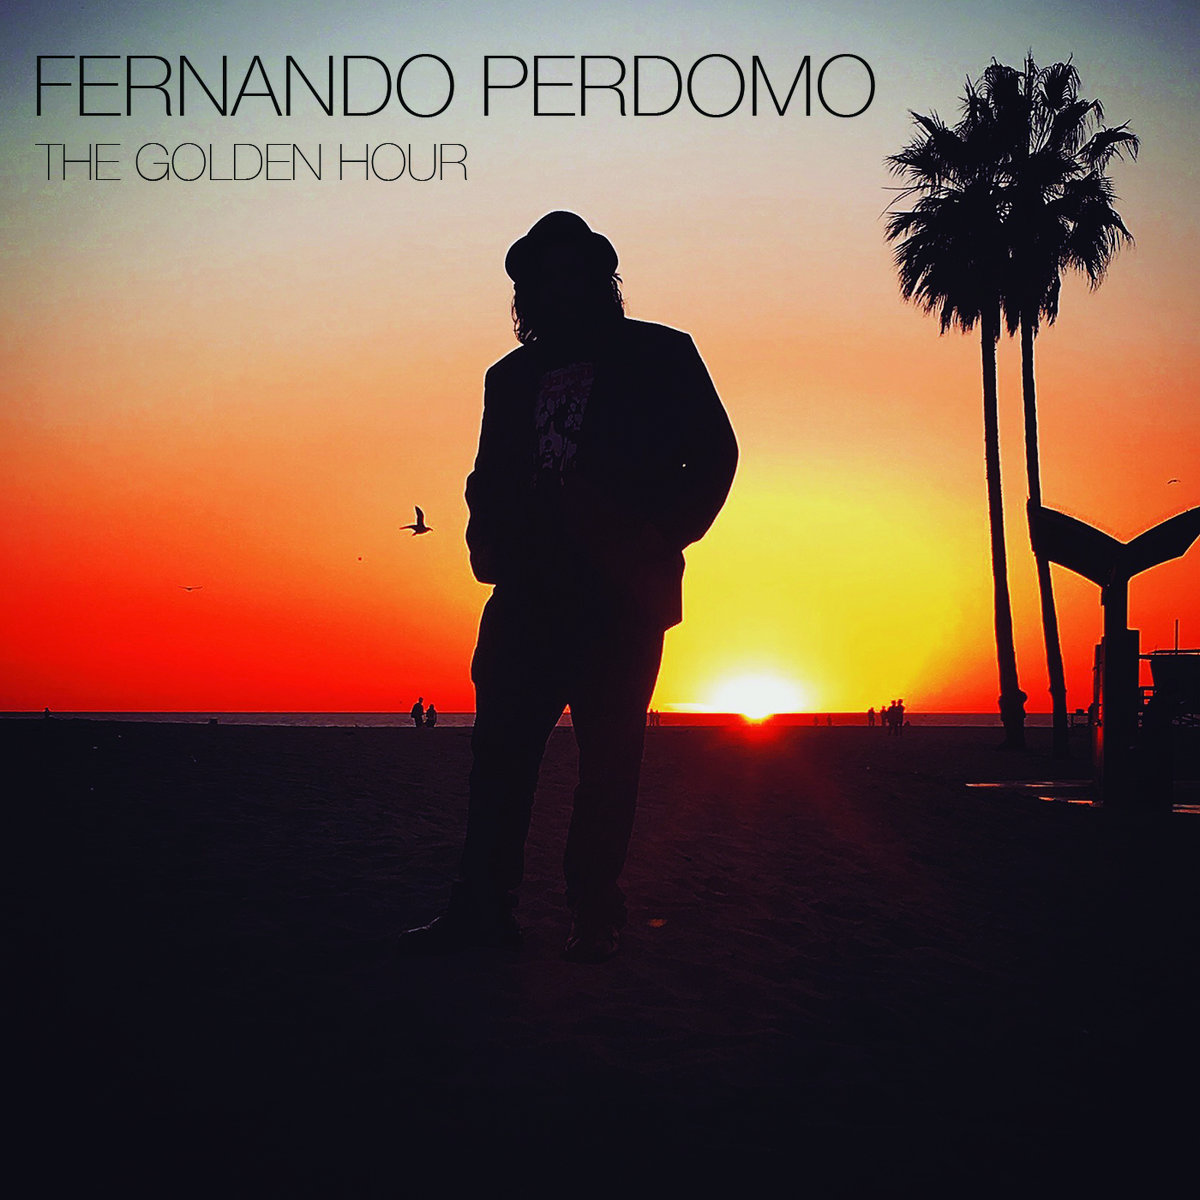 Fernando Perdomo